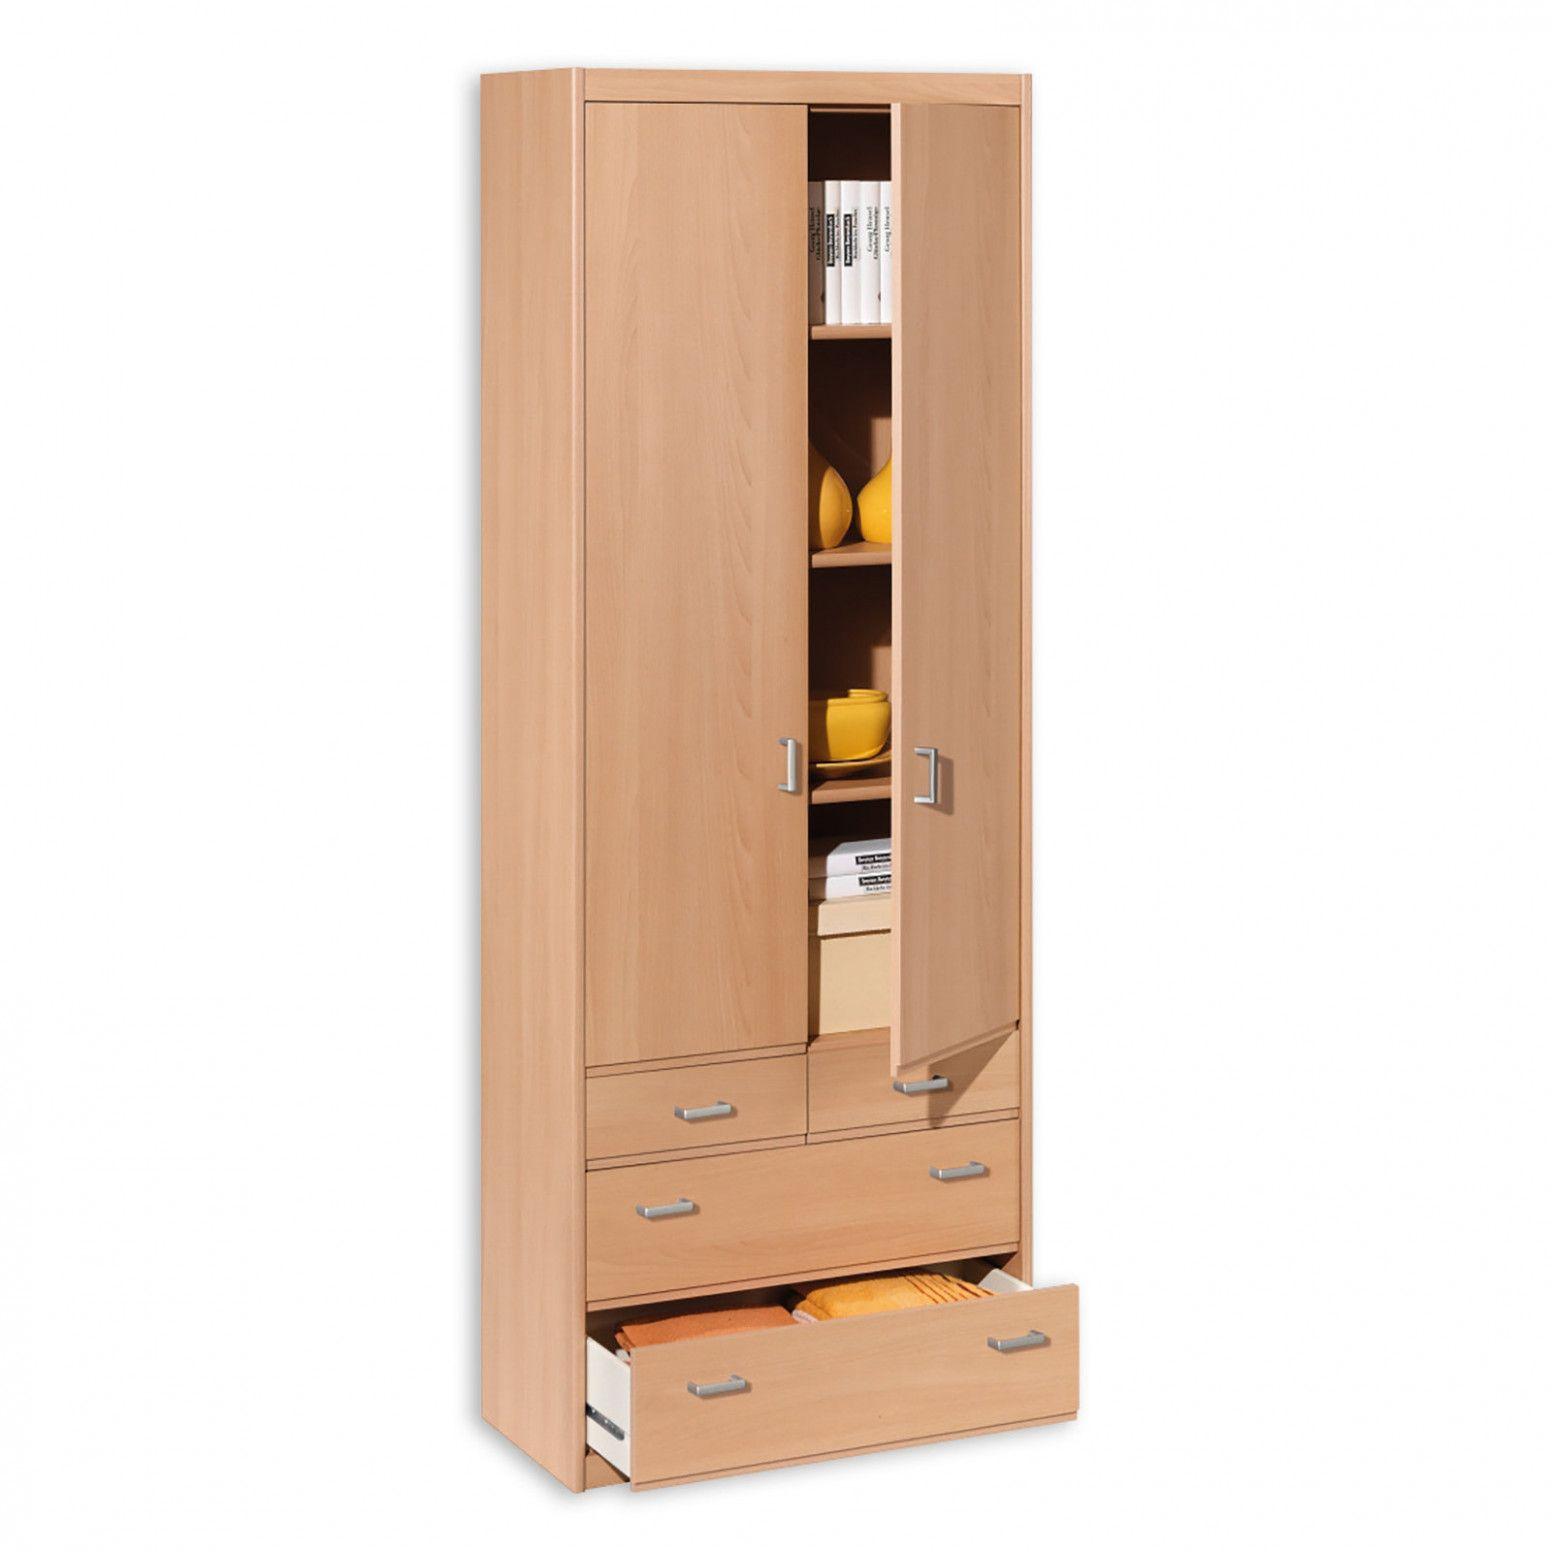 Ikea Kommode Gebraucht 2021